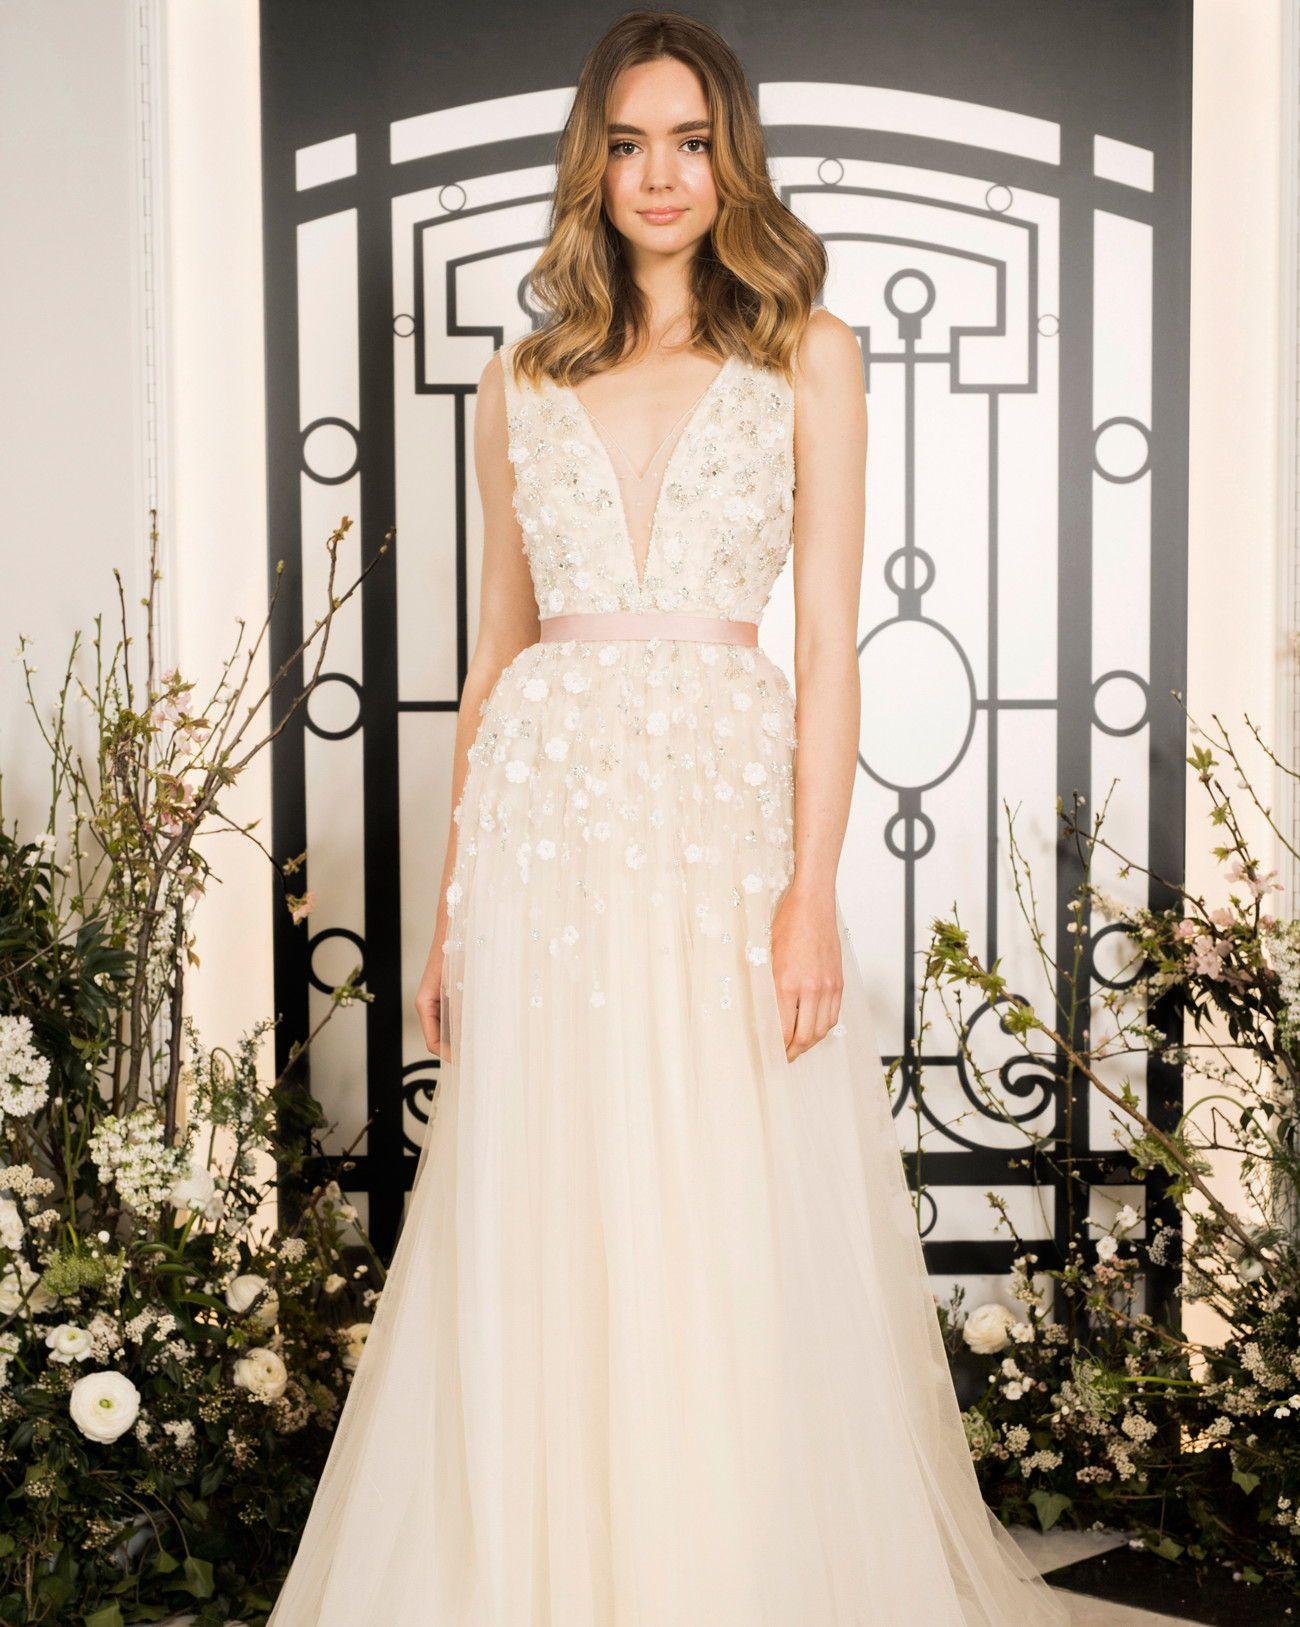 3ba8c6111a37 ... #Wedding #Fashion #BridalFashionWeek #Designer #Bridal #Dress  #WeddingDress #HighFashion #JennyPackham | Martha Stewart Weddings - Jenny  Packham Spring ...